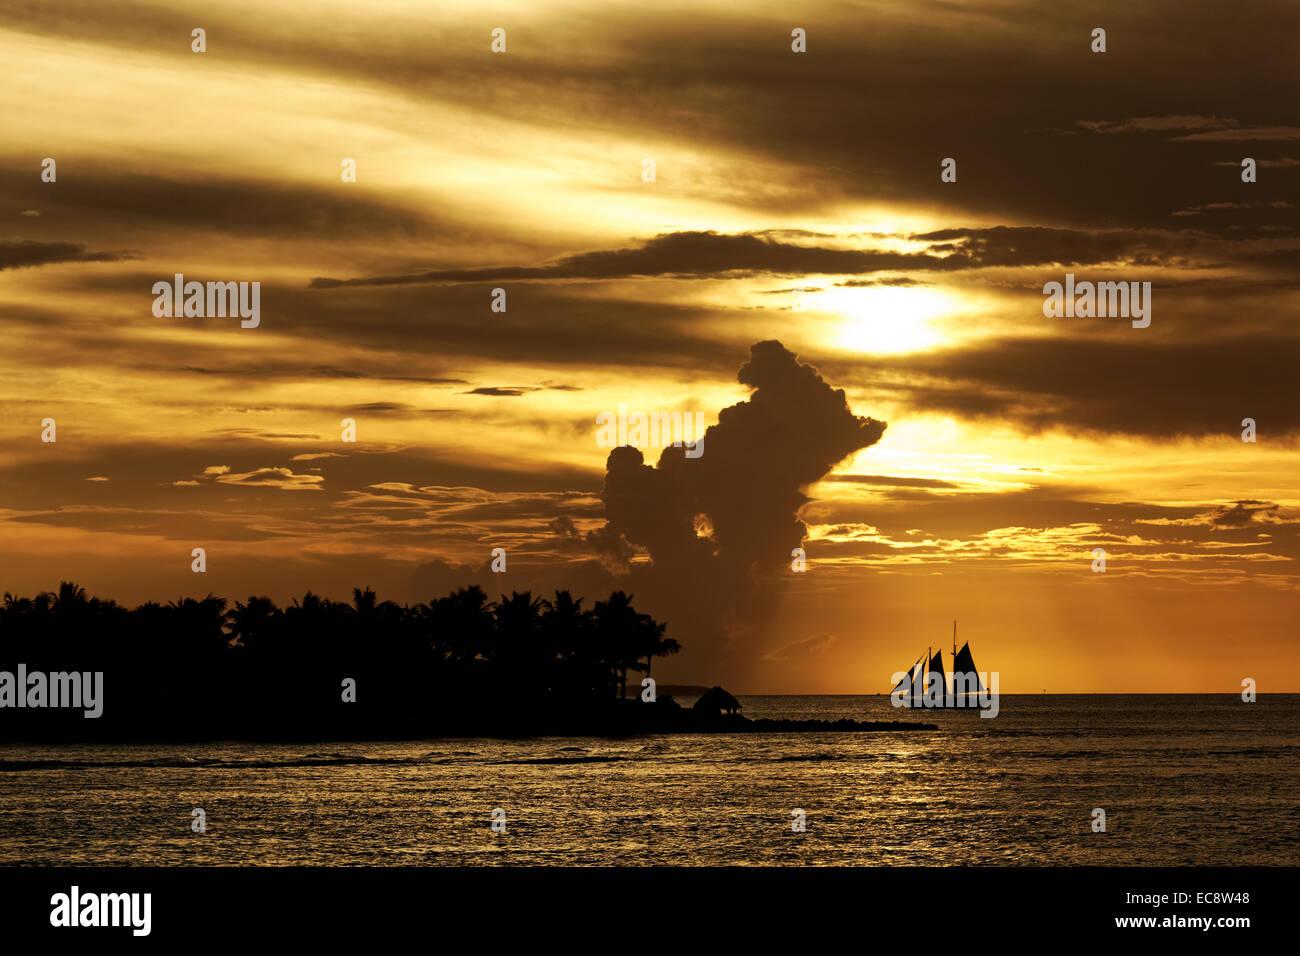 Golden Sunset at Key West, Florida, USA - Stock Image